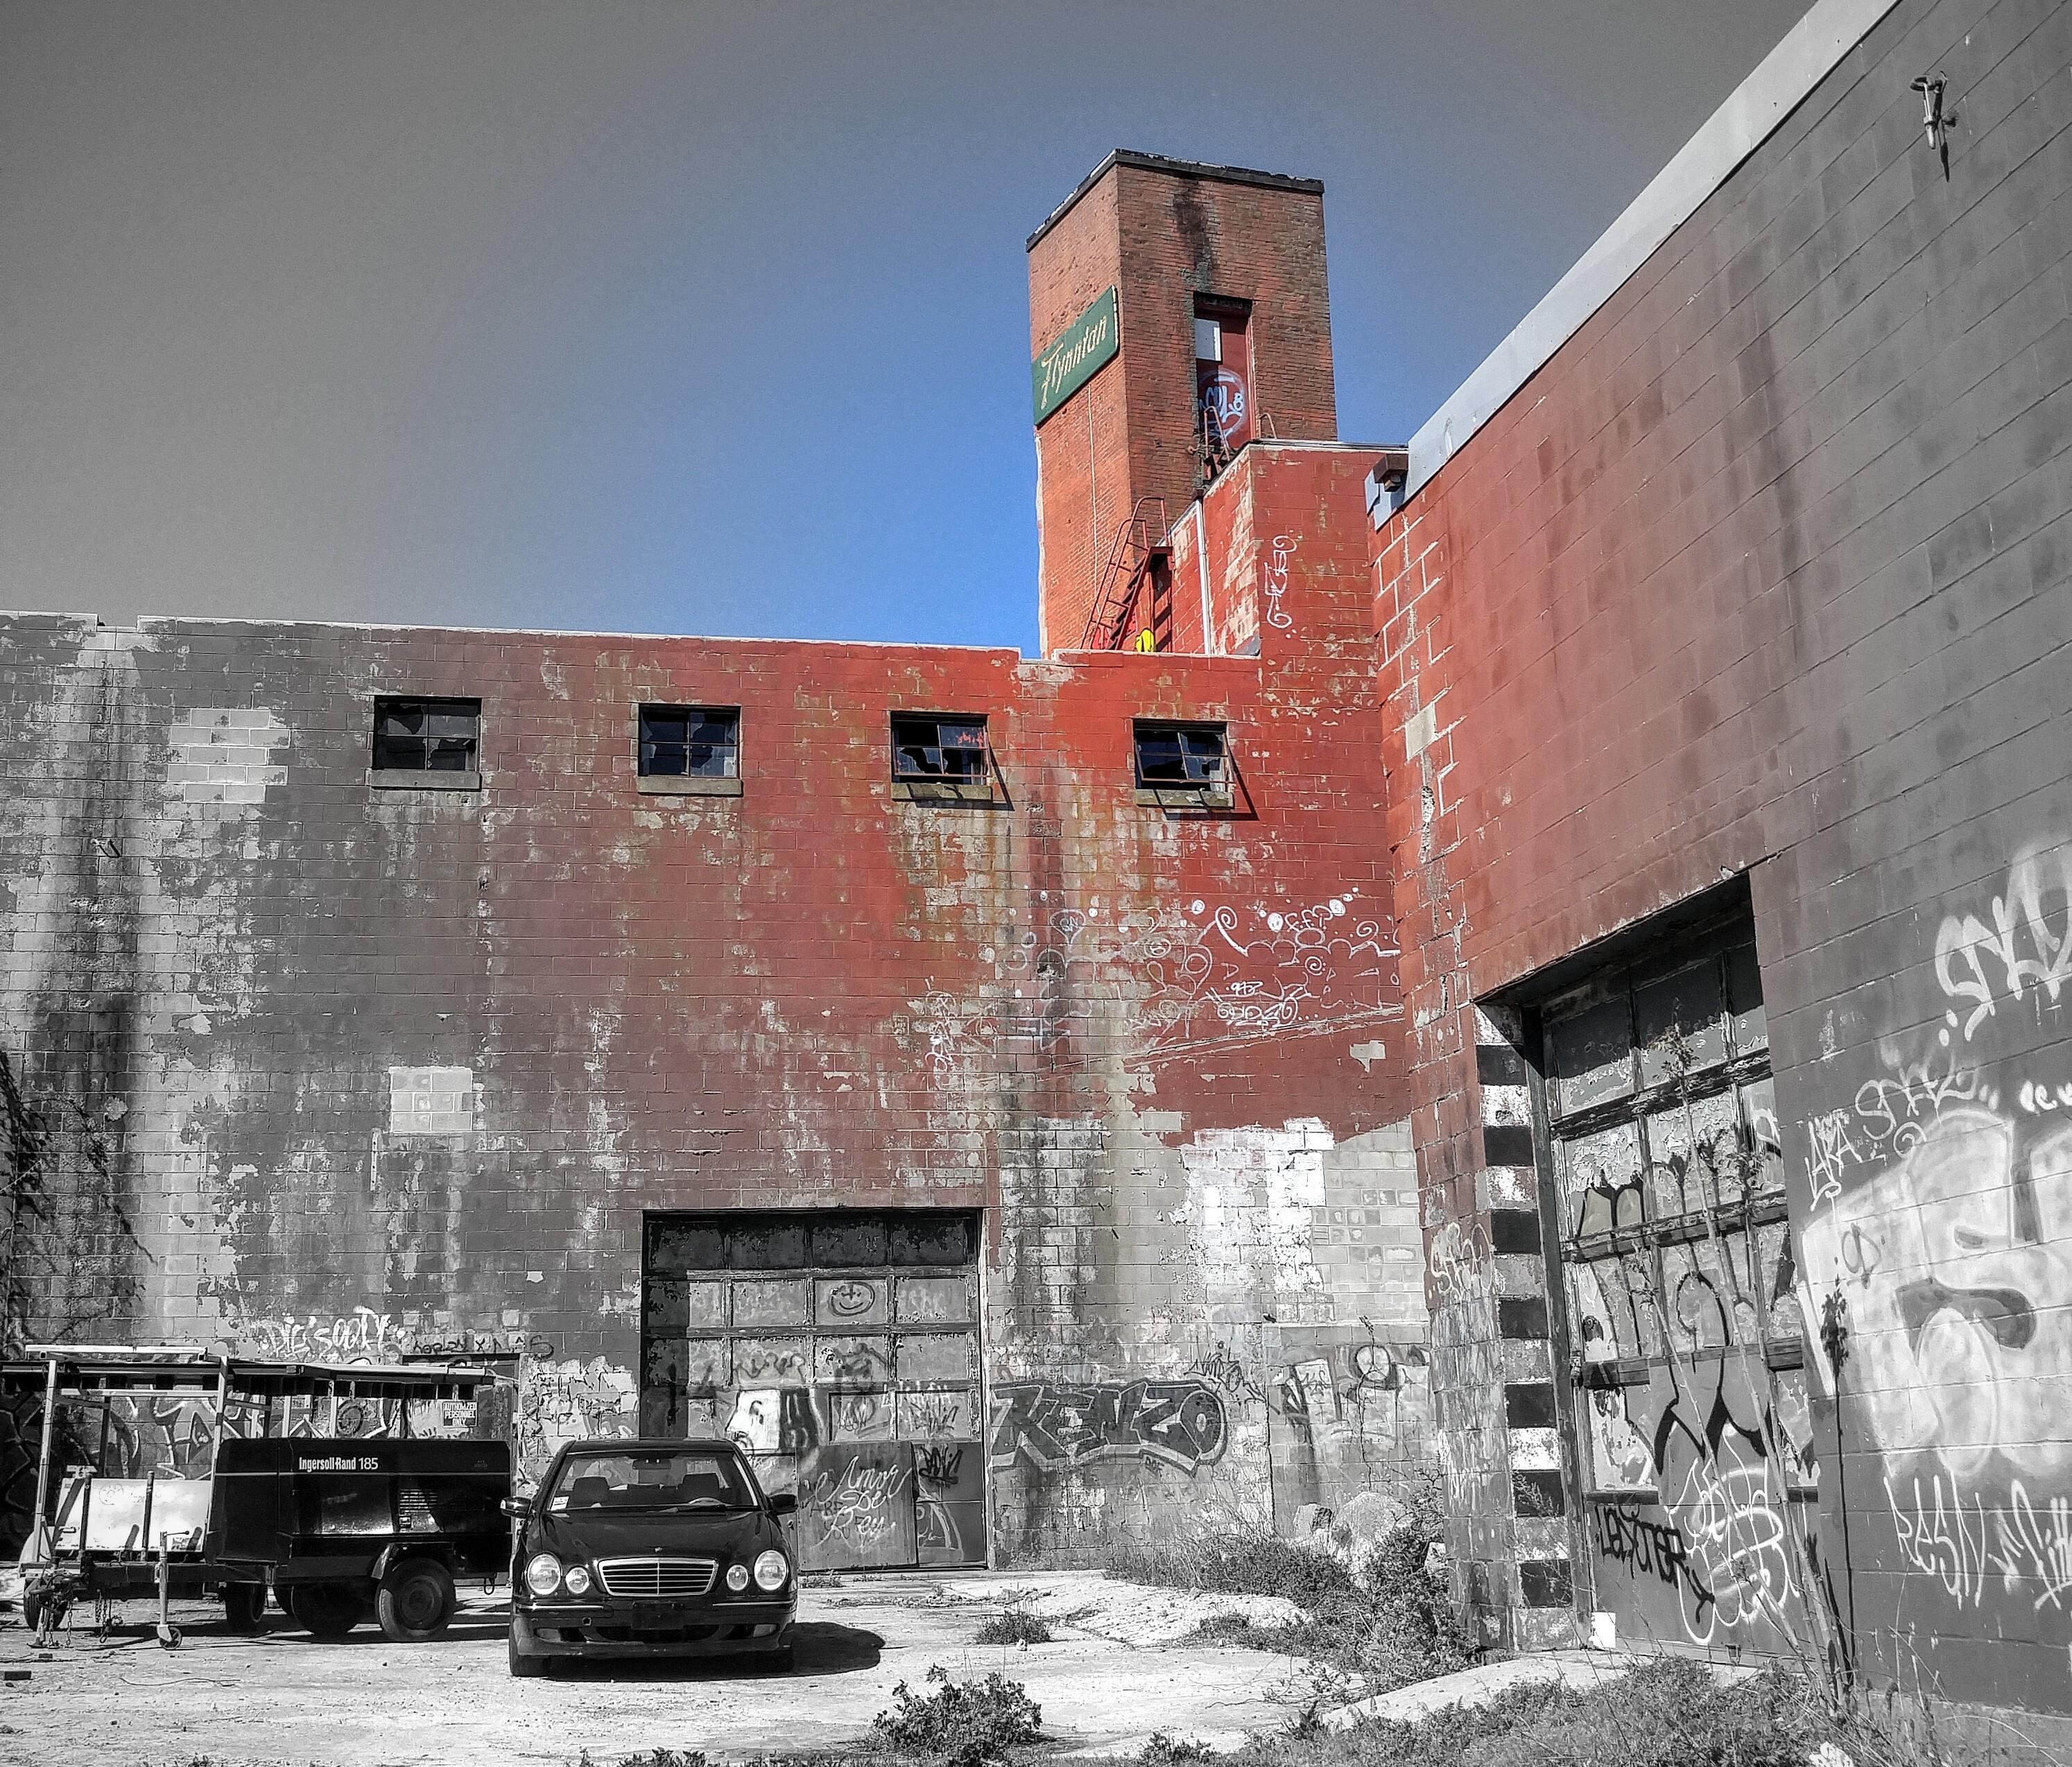 Urban Archaeology 14